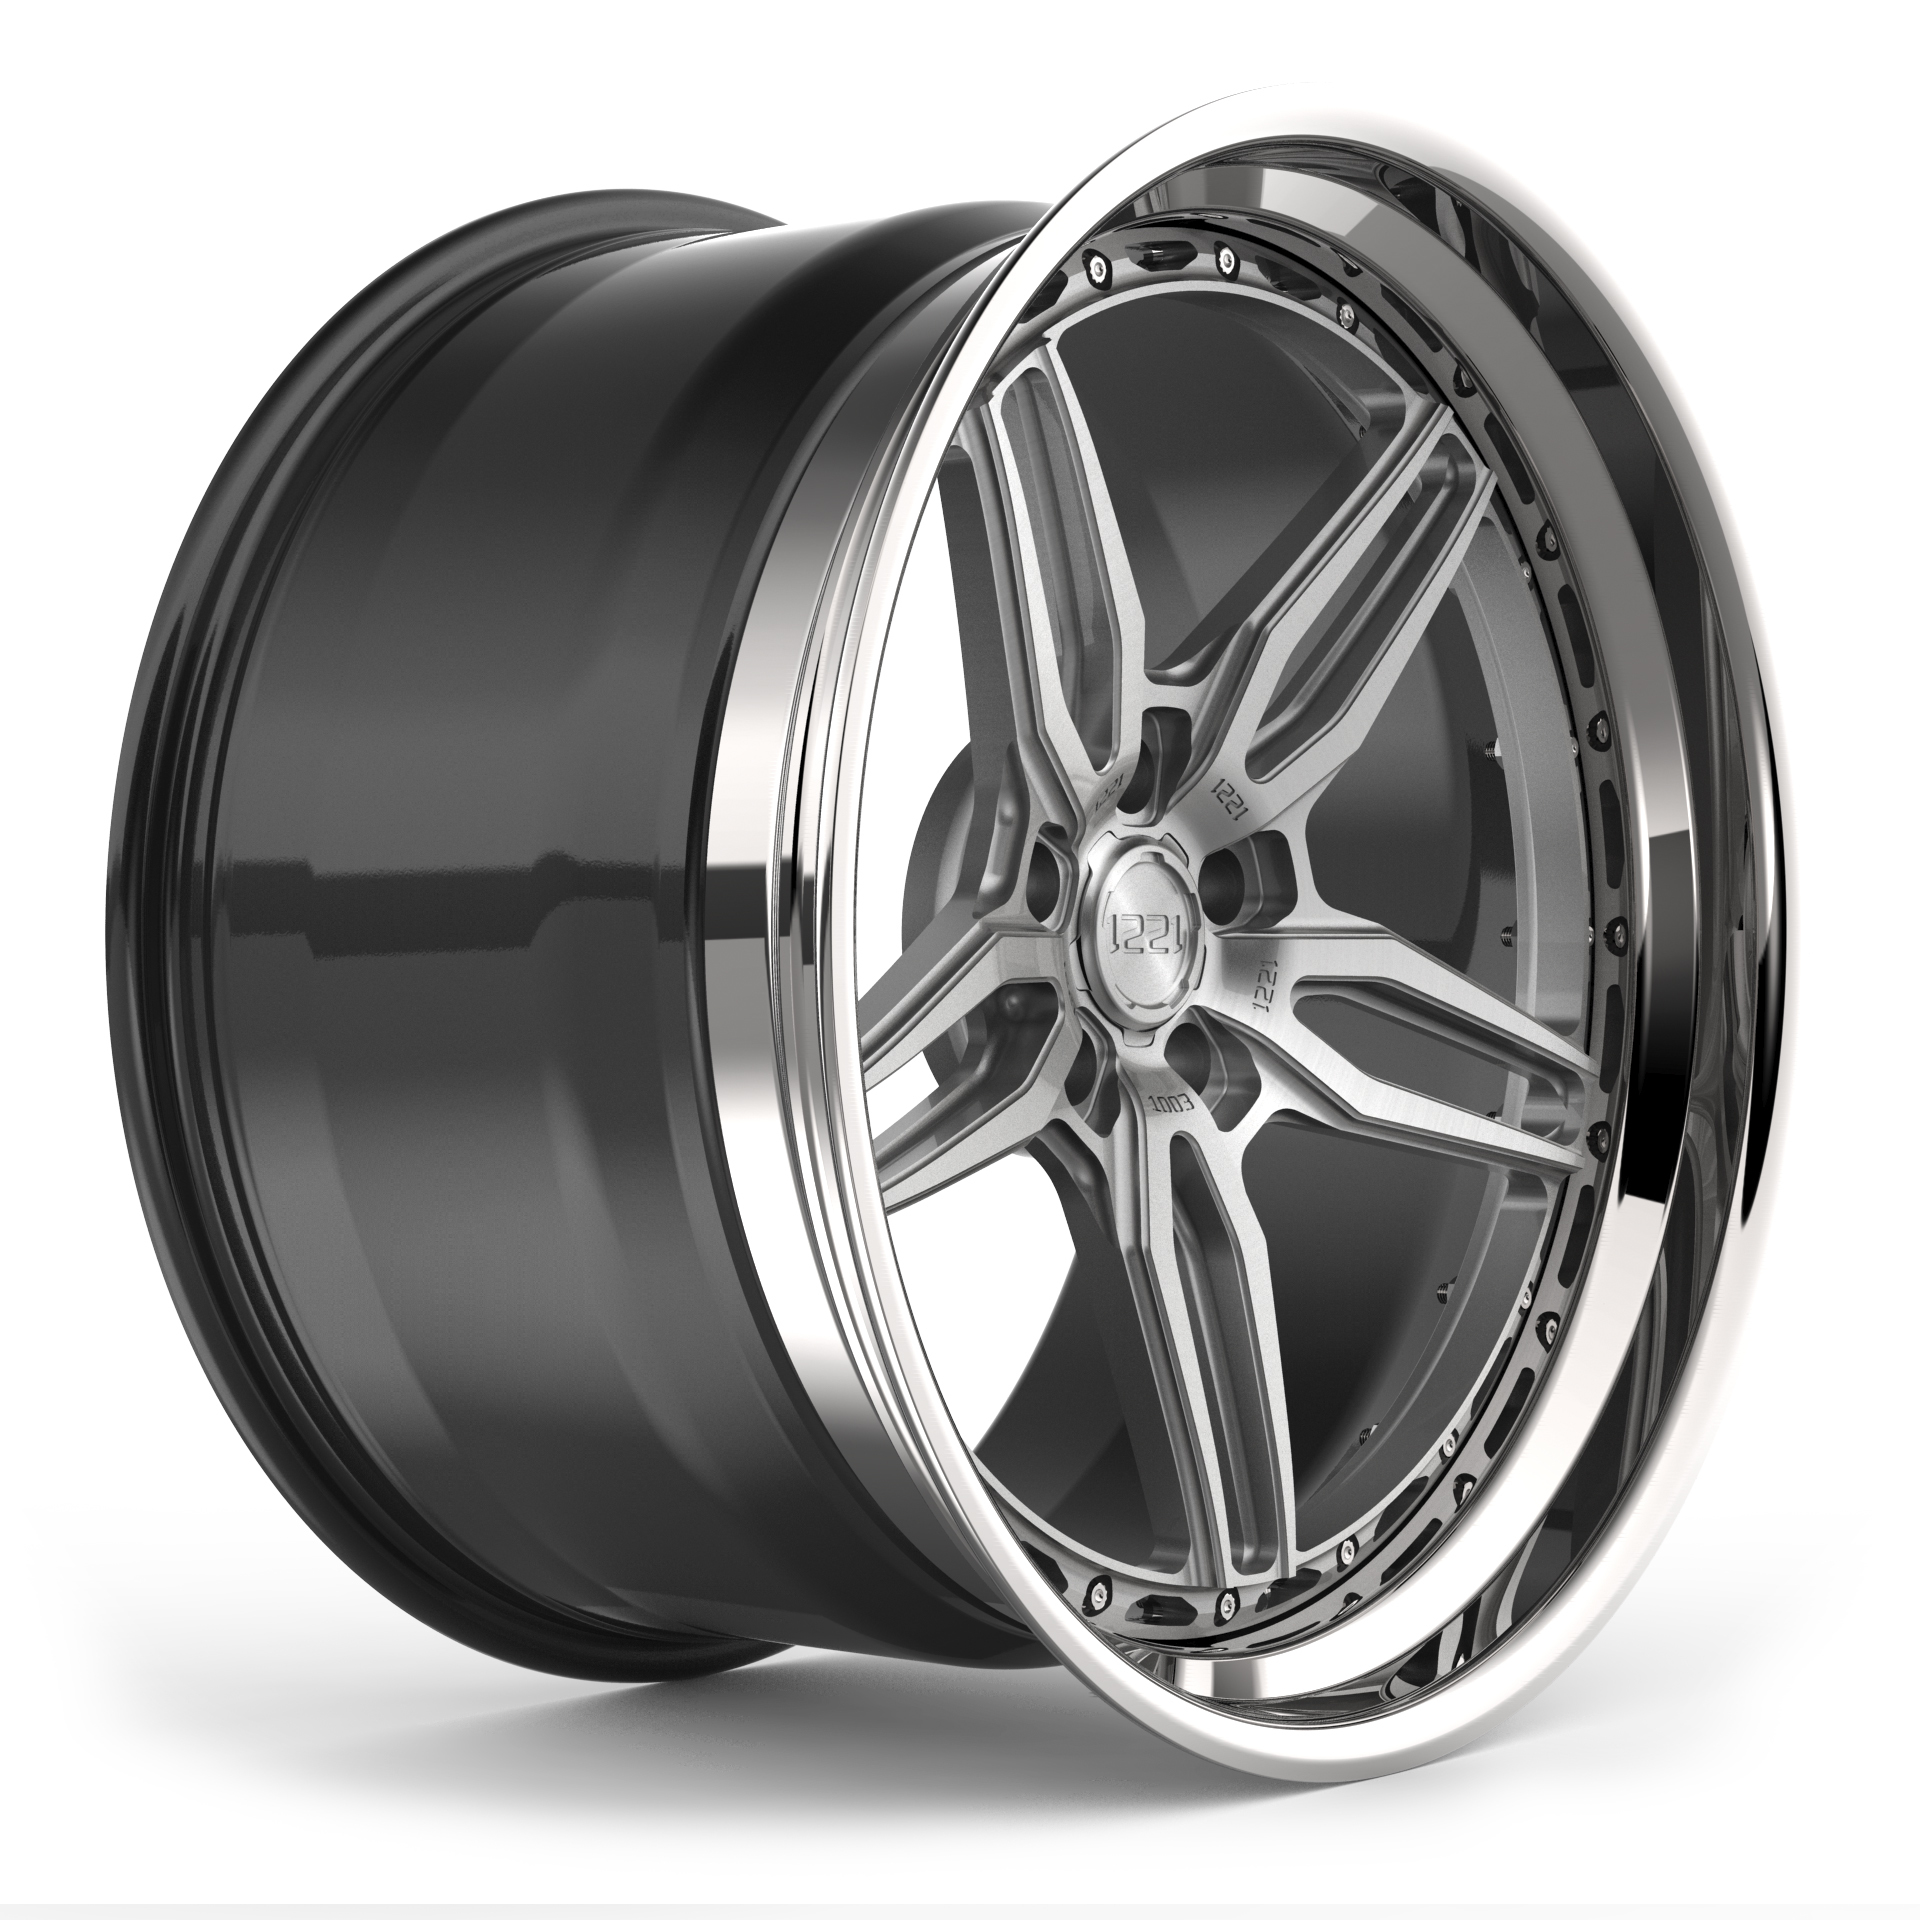 1221 Wheels 1003 AP3X APEX3.0 forged wheels